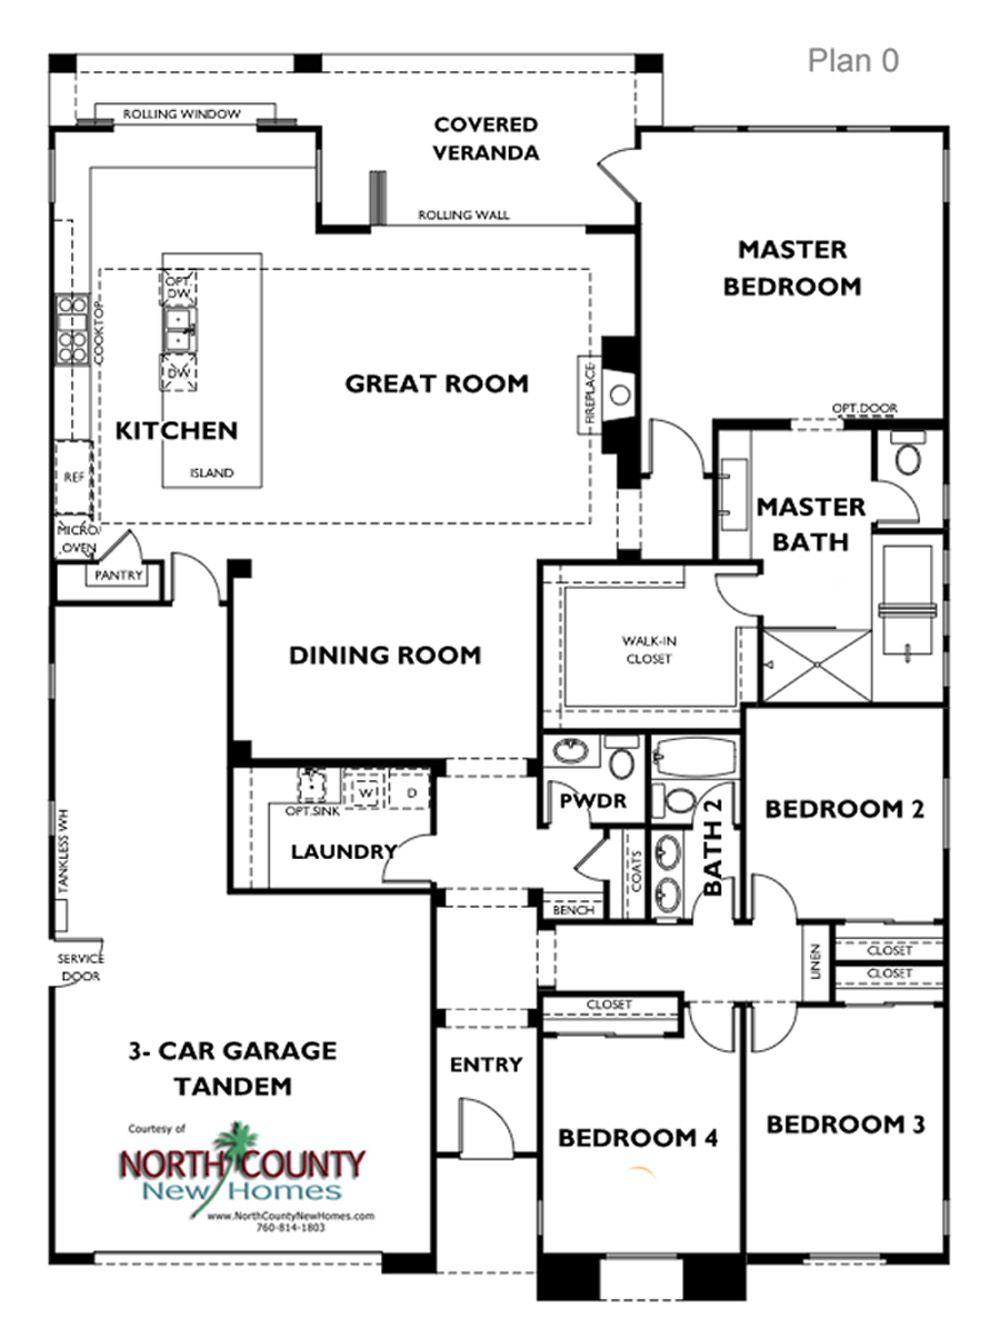 Floor Plans Lanai Ii New Homes In Carlsbad North County New Homes Floor Plans Ranch Home Floor Plans Floor Plans Ranch